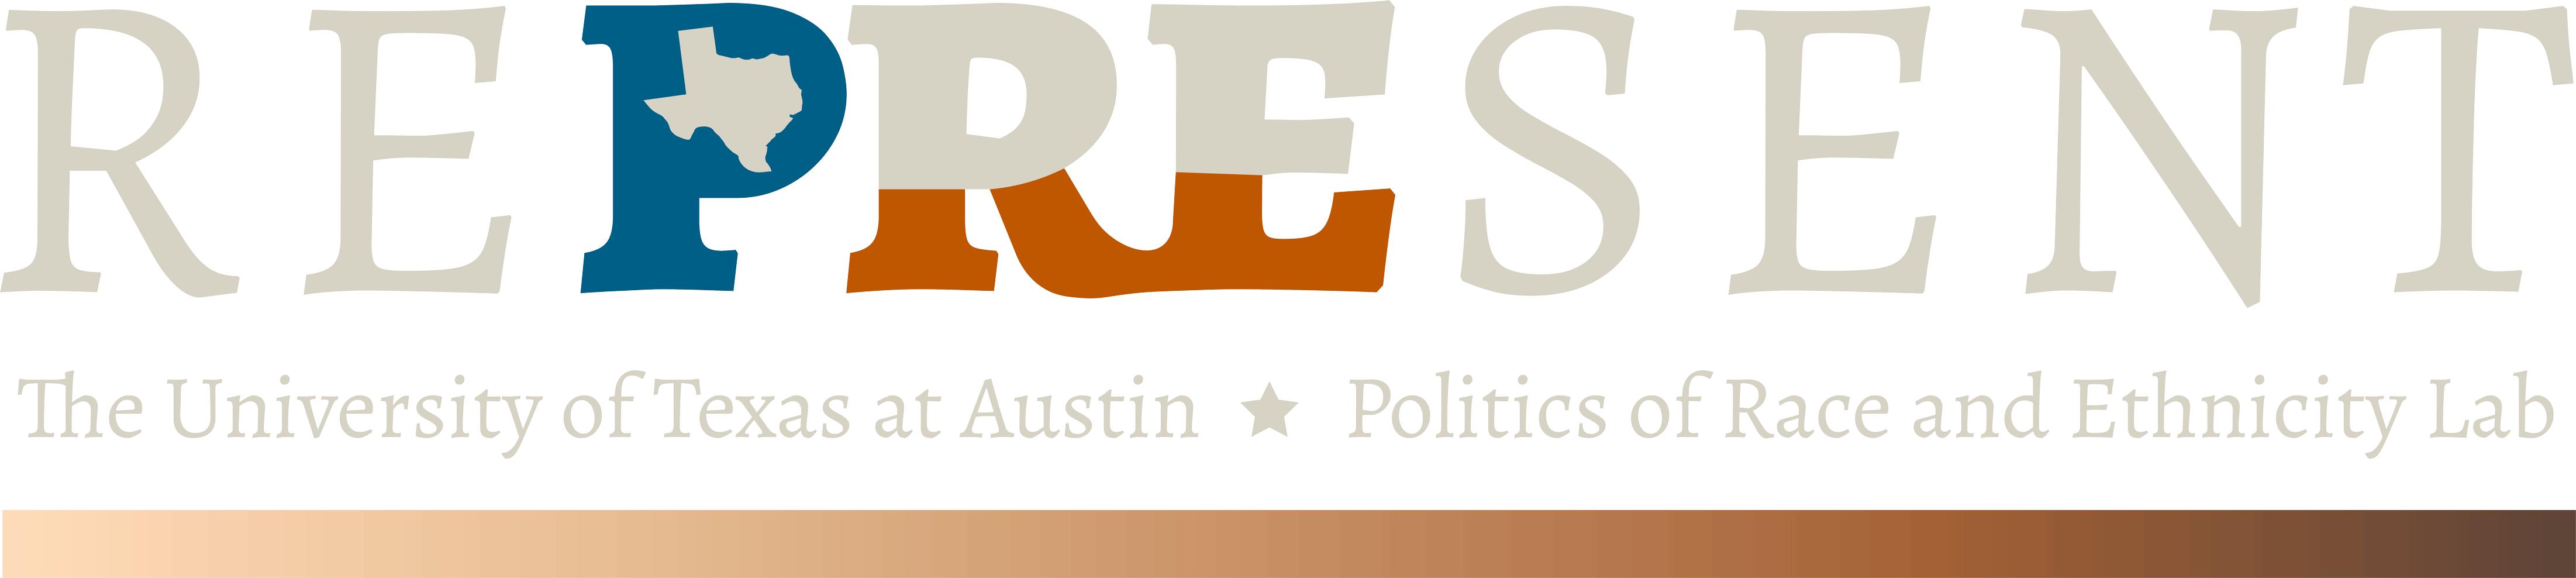 Politicsof Raceand Ethnicity Lab